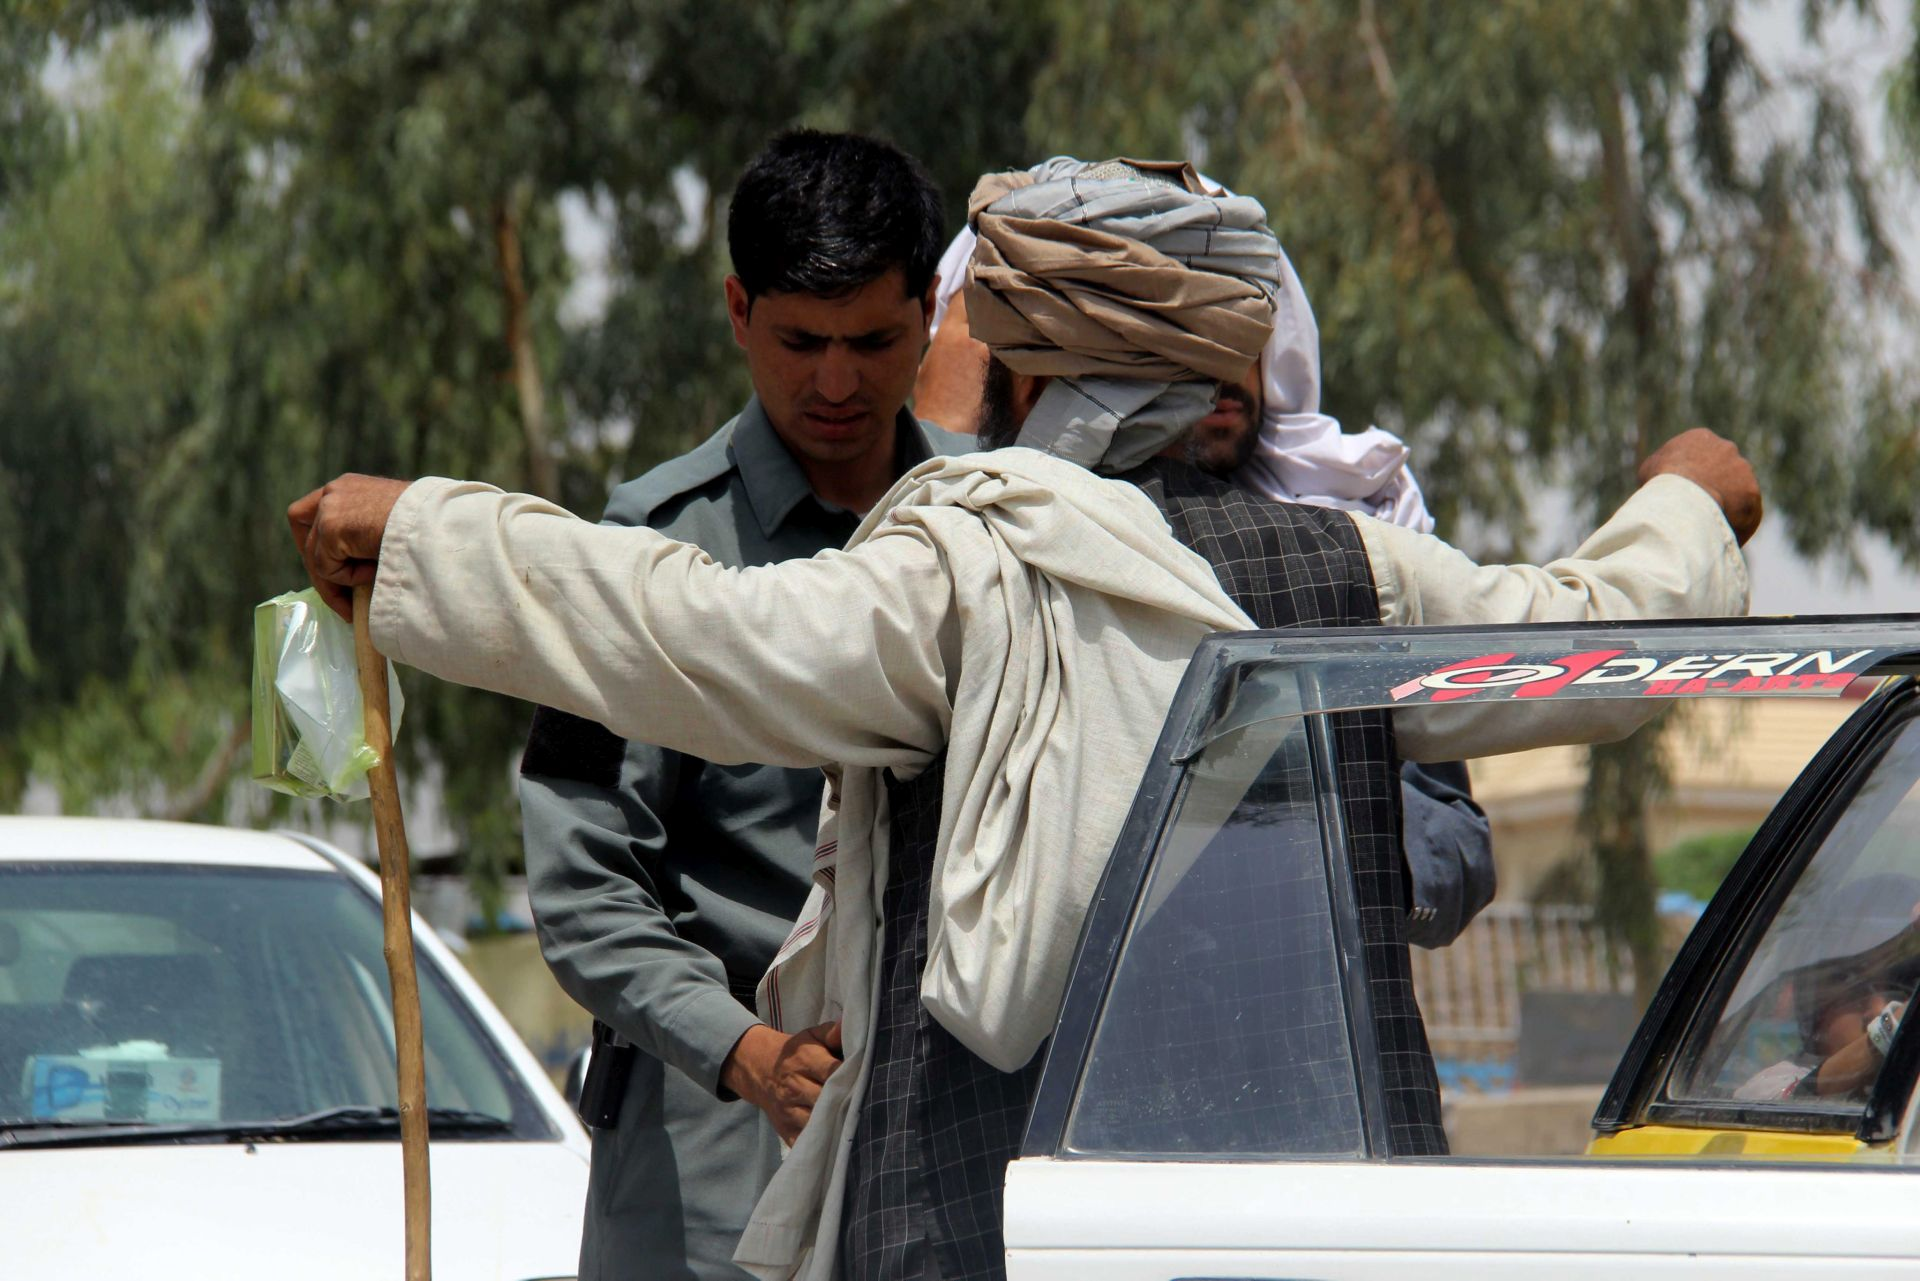 NAKON SMRTI MANSURA: Afganistanski talibani izabrali novog šefa